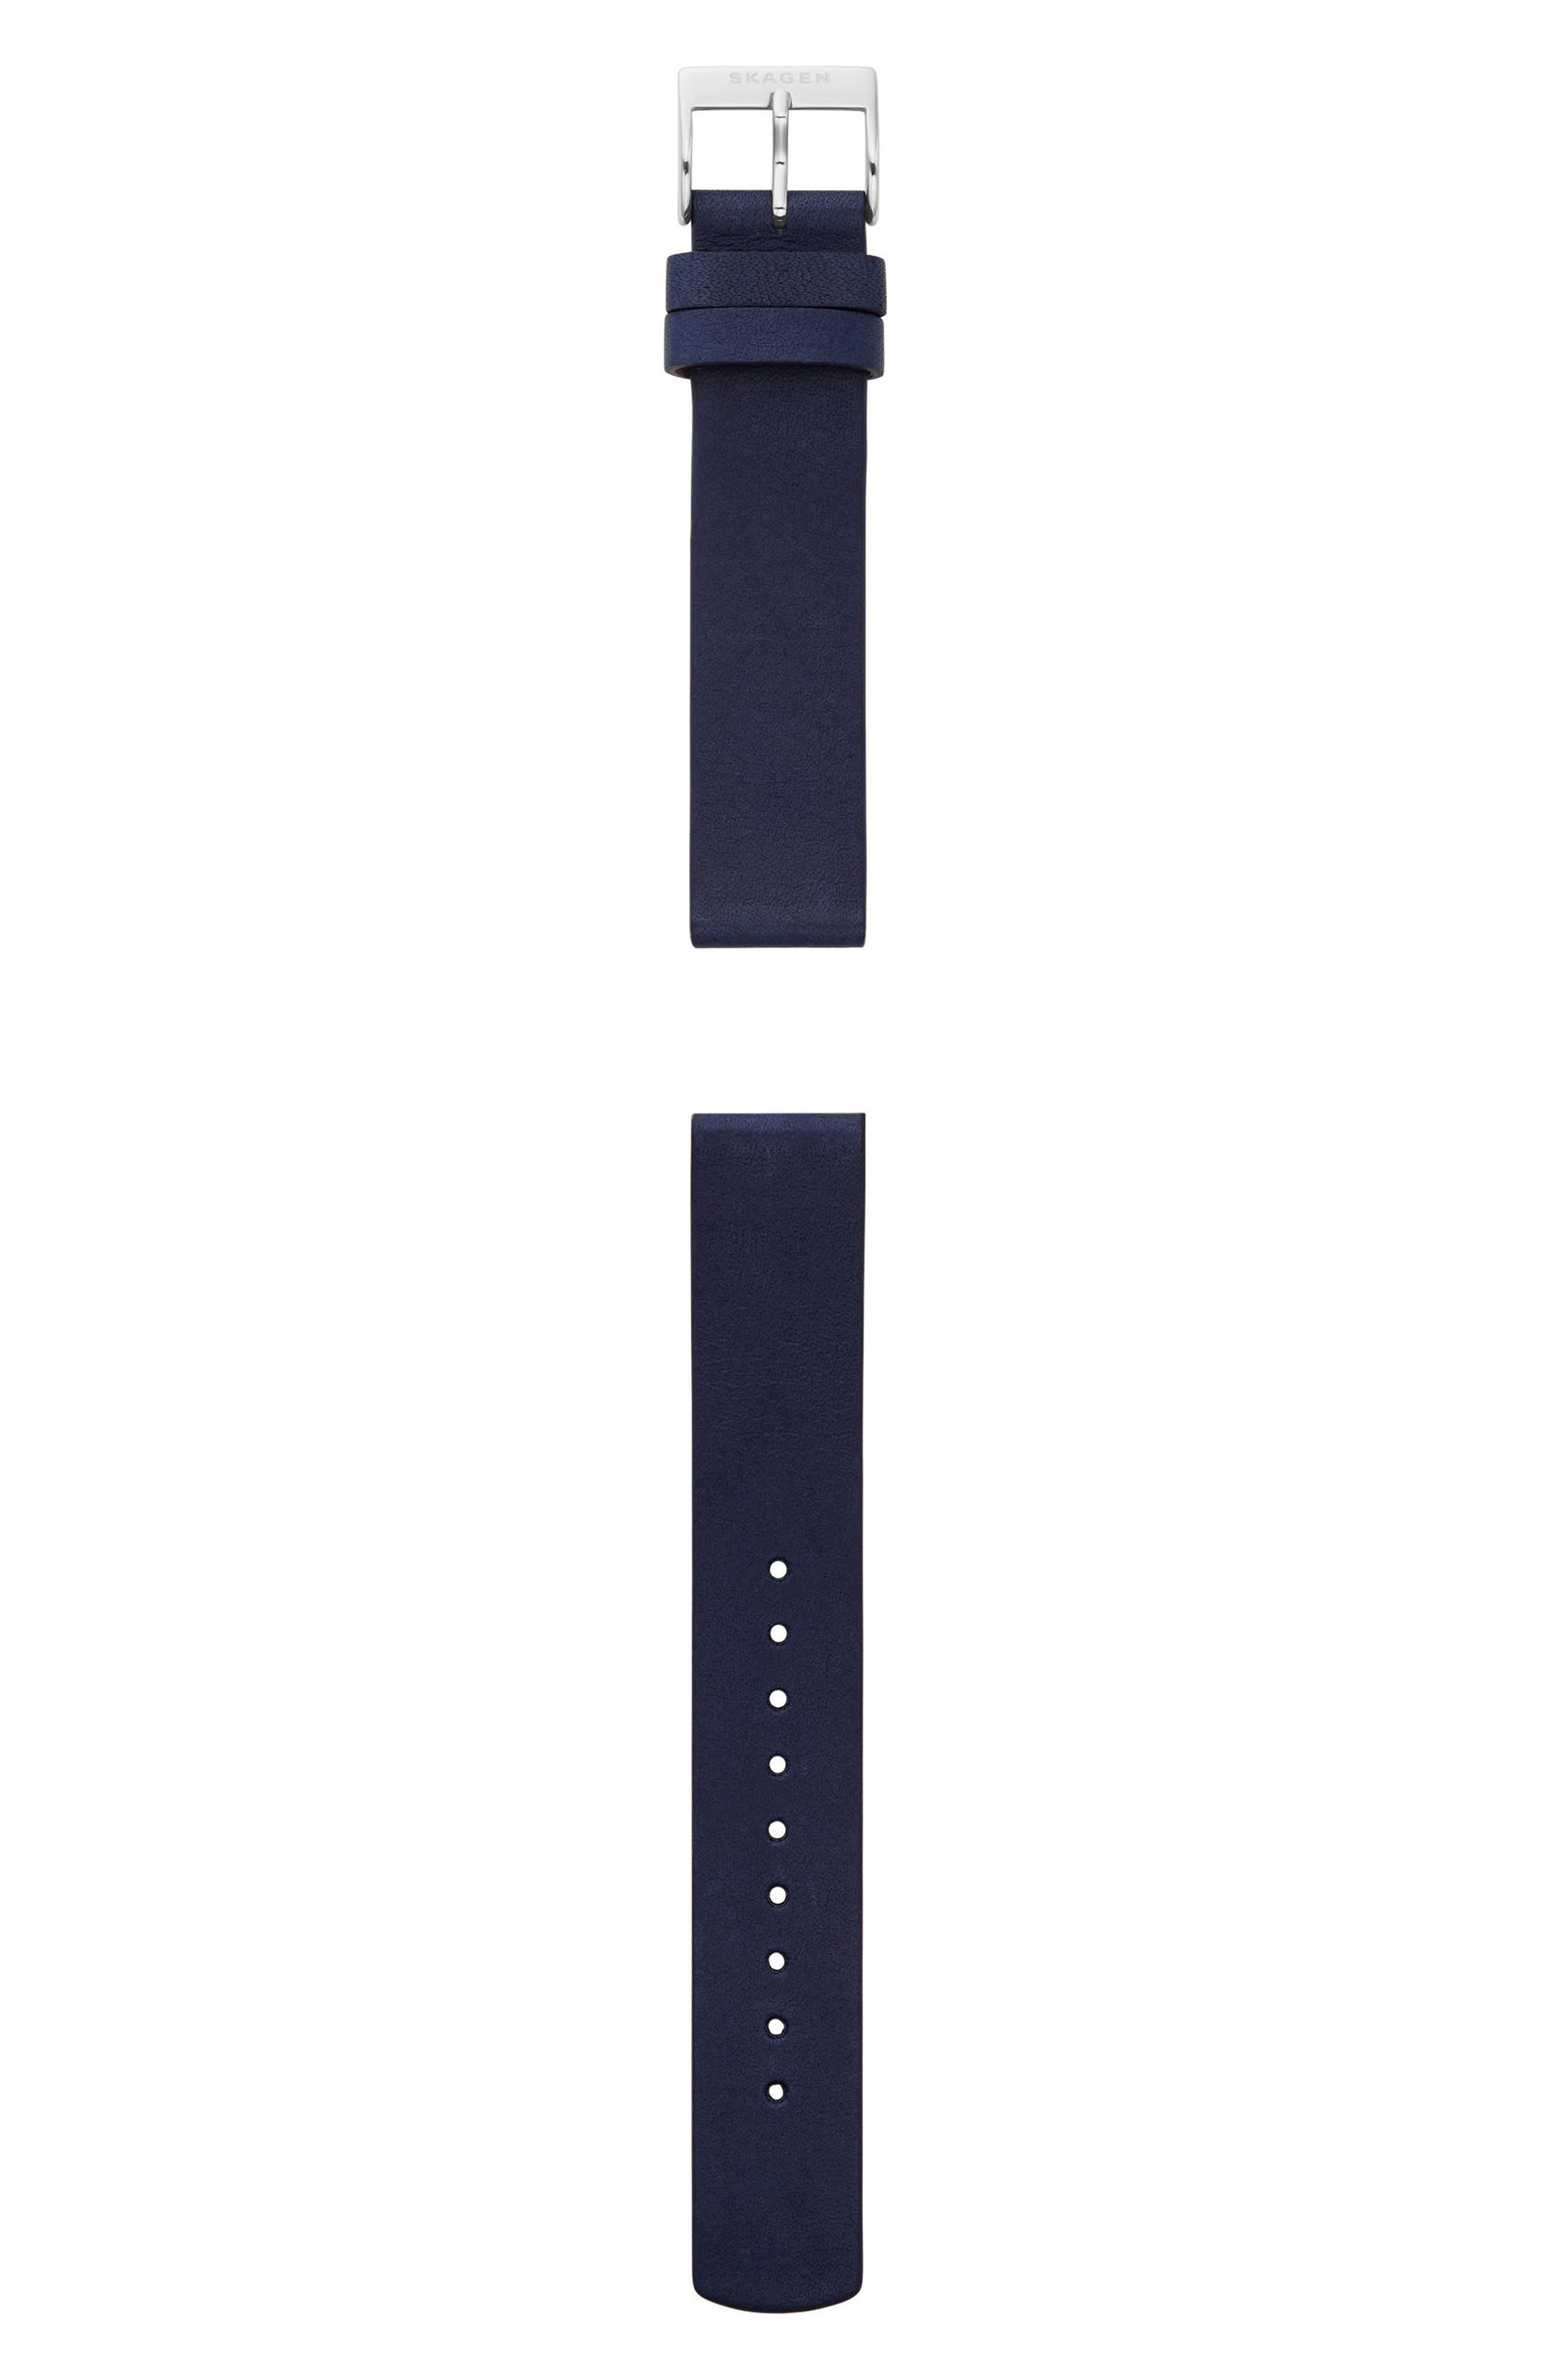 Alternate Image 1 Selected - Skagen Leather Watch Strap, 16mm